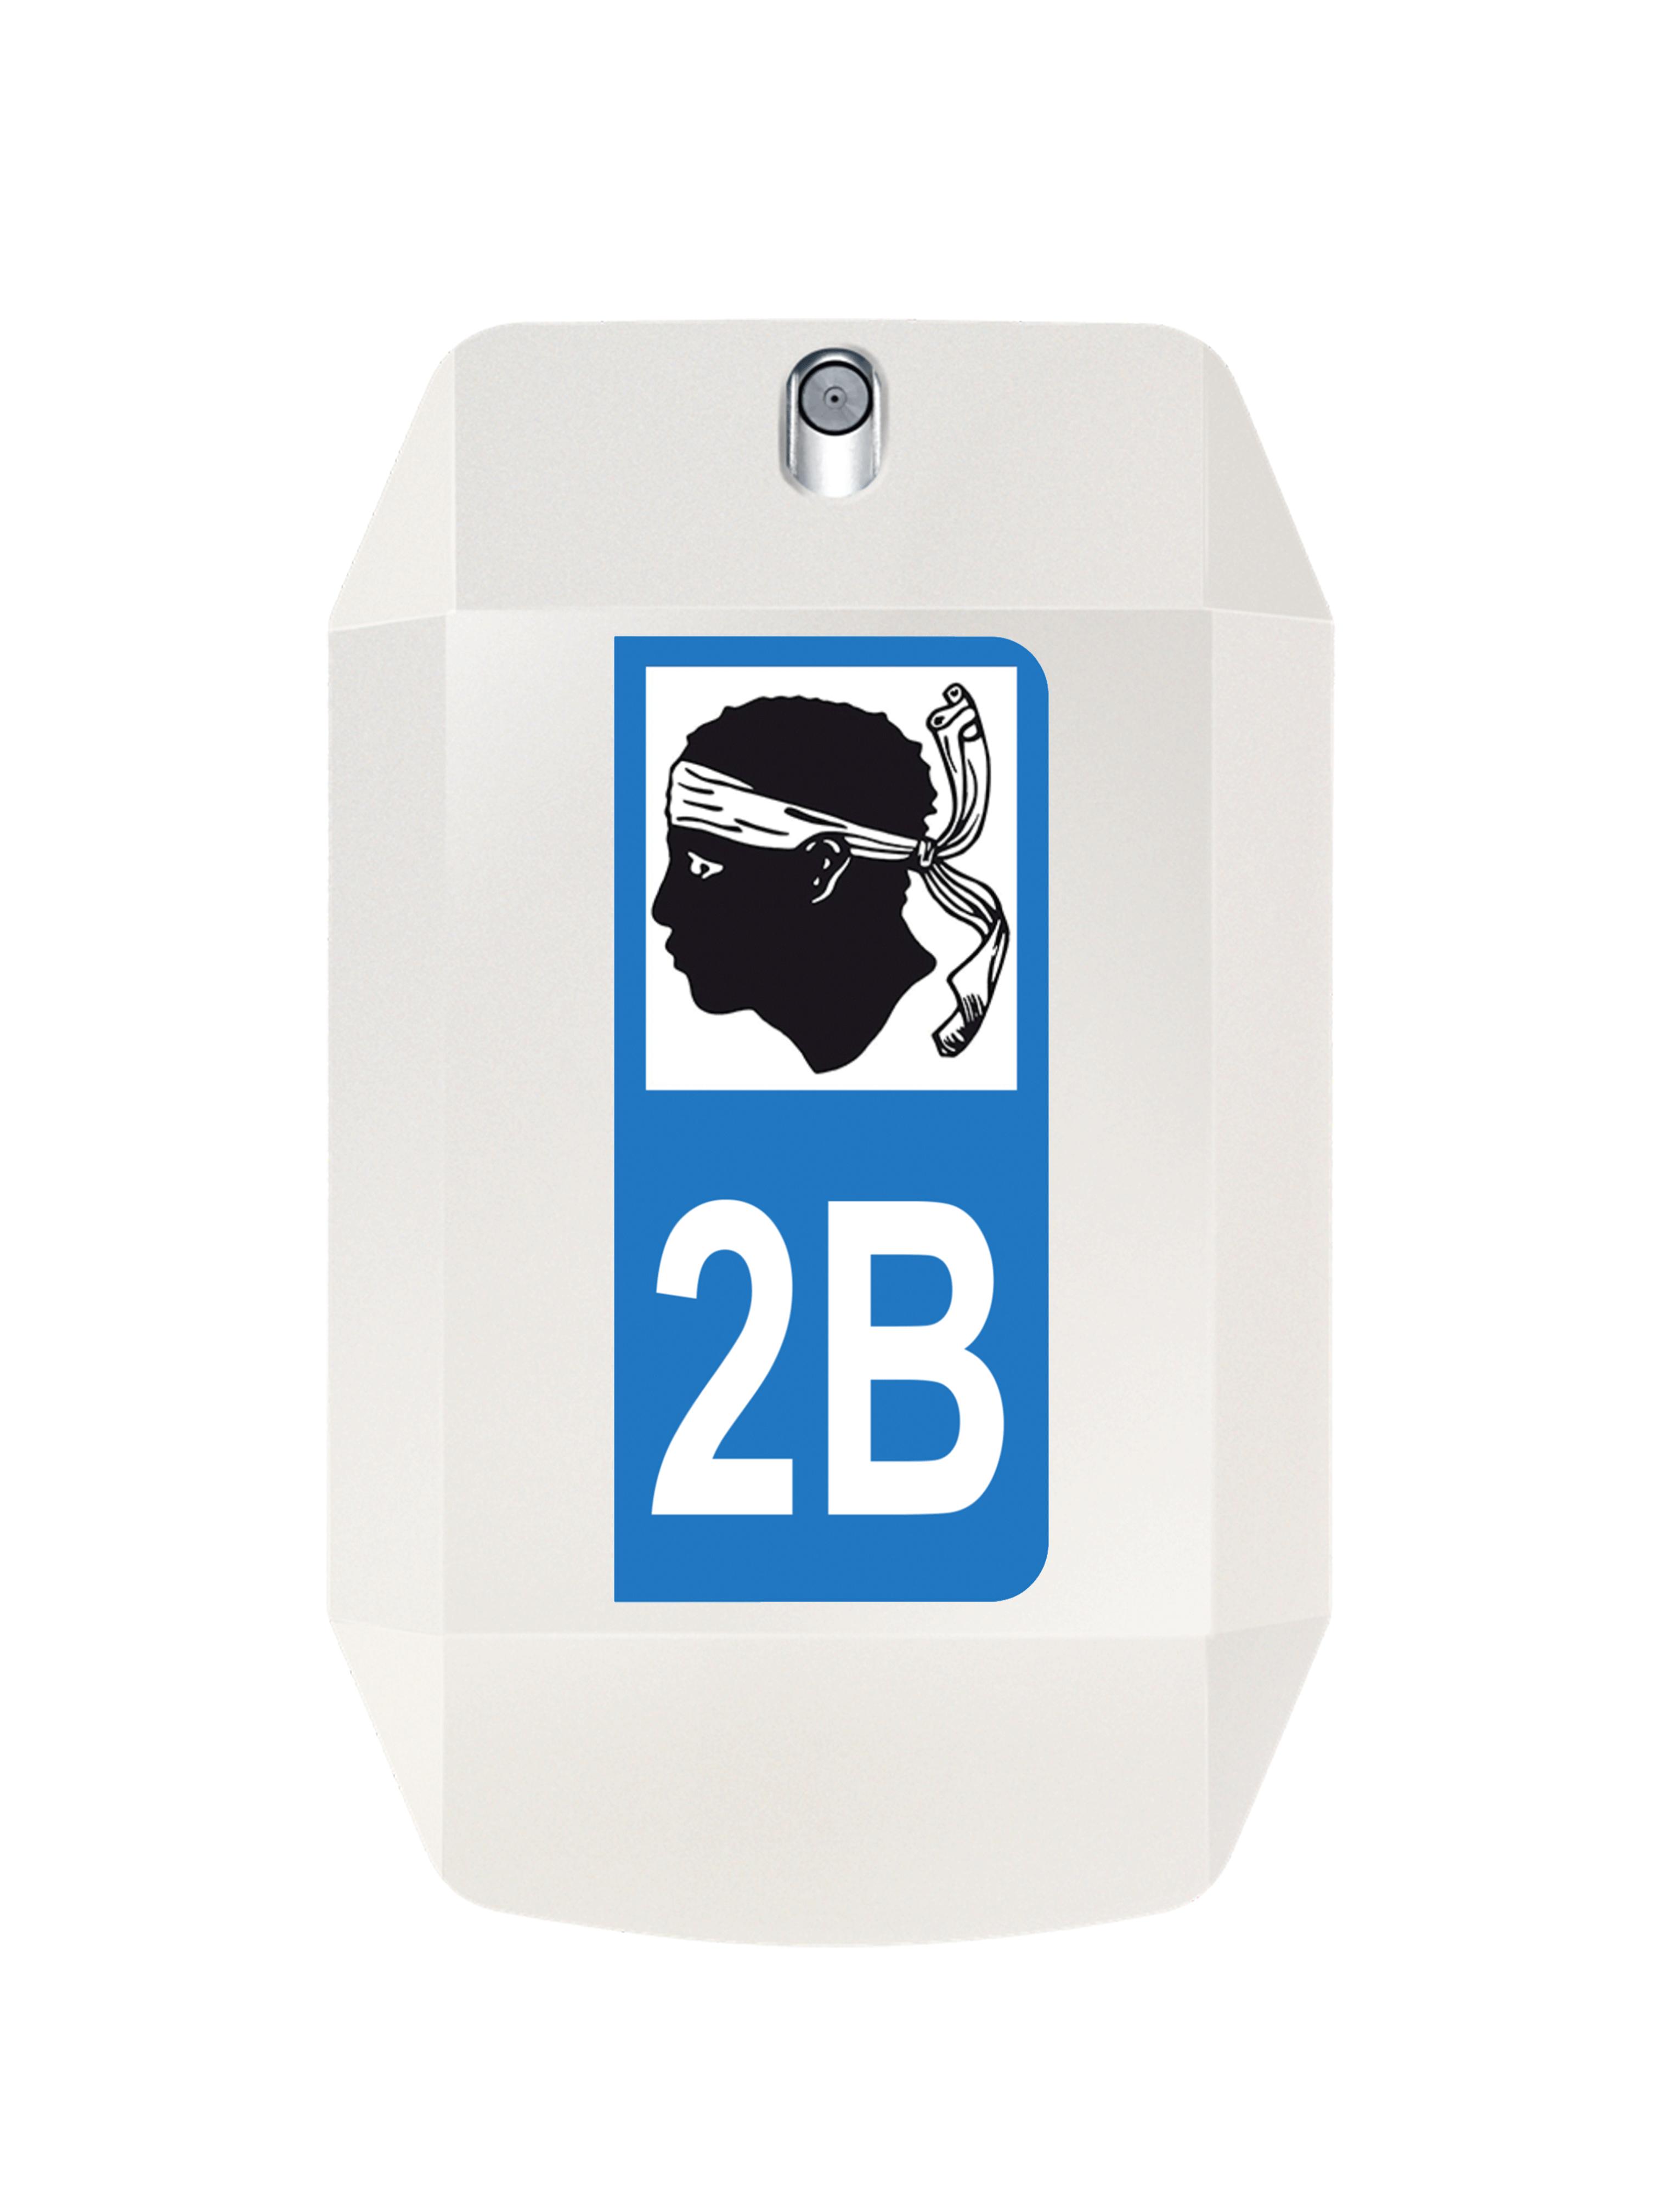 Kutjo 2B – Nettoyant Ecran Téléphone Portable, Smartphone – Spray 15ml